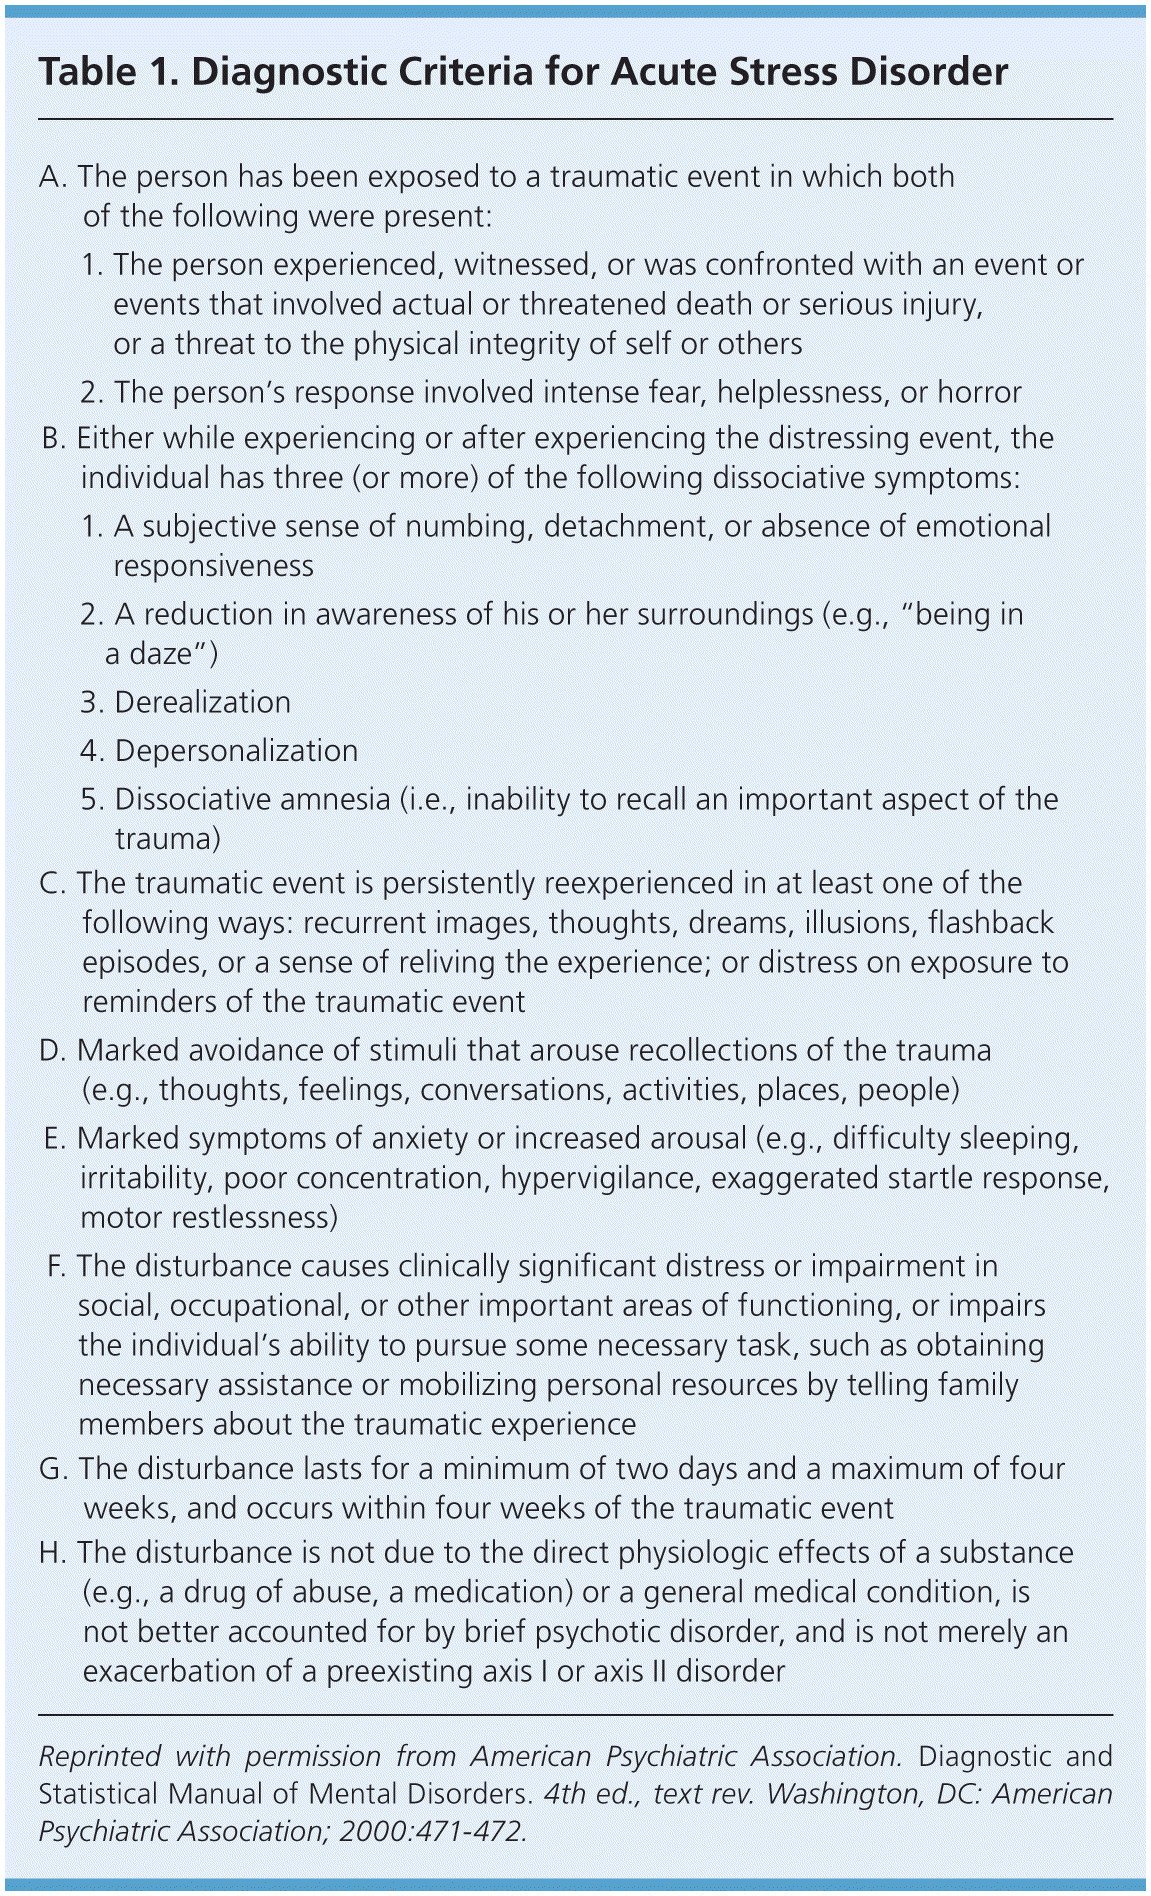 Spani Post Acute Withdrawal Syndrome Worksheet As Balancing And Post Acute Withdrawal Syndrome Worksheet